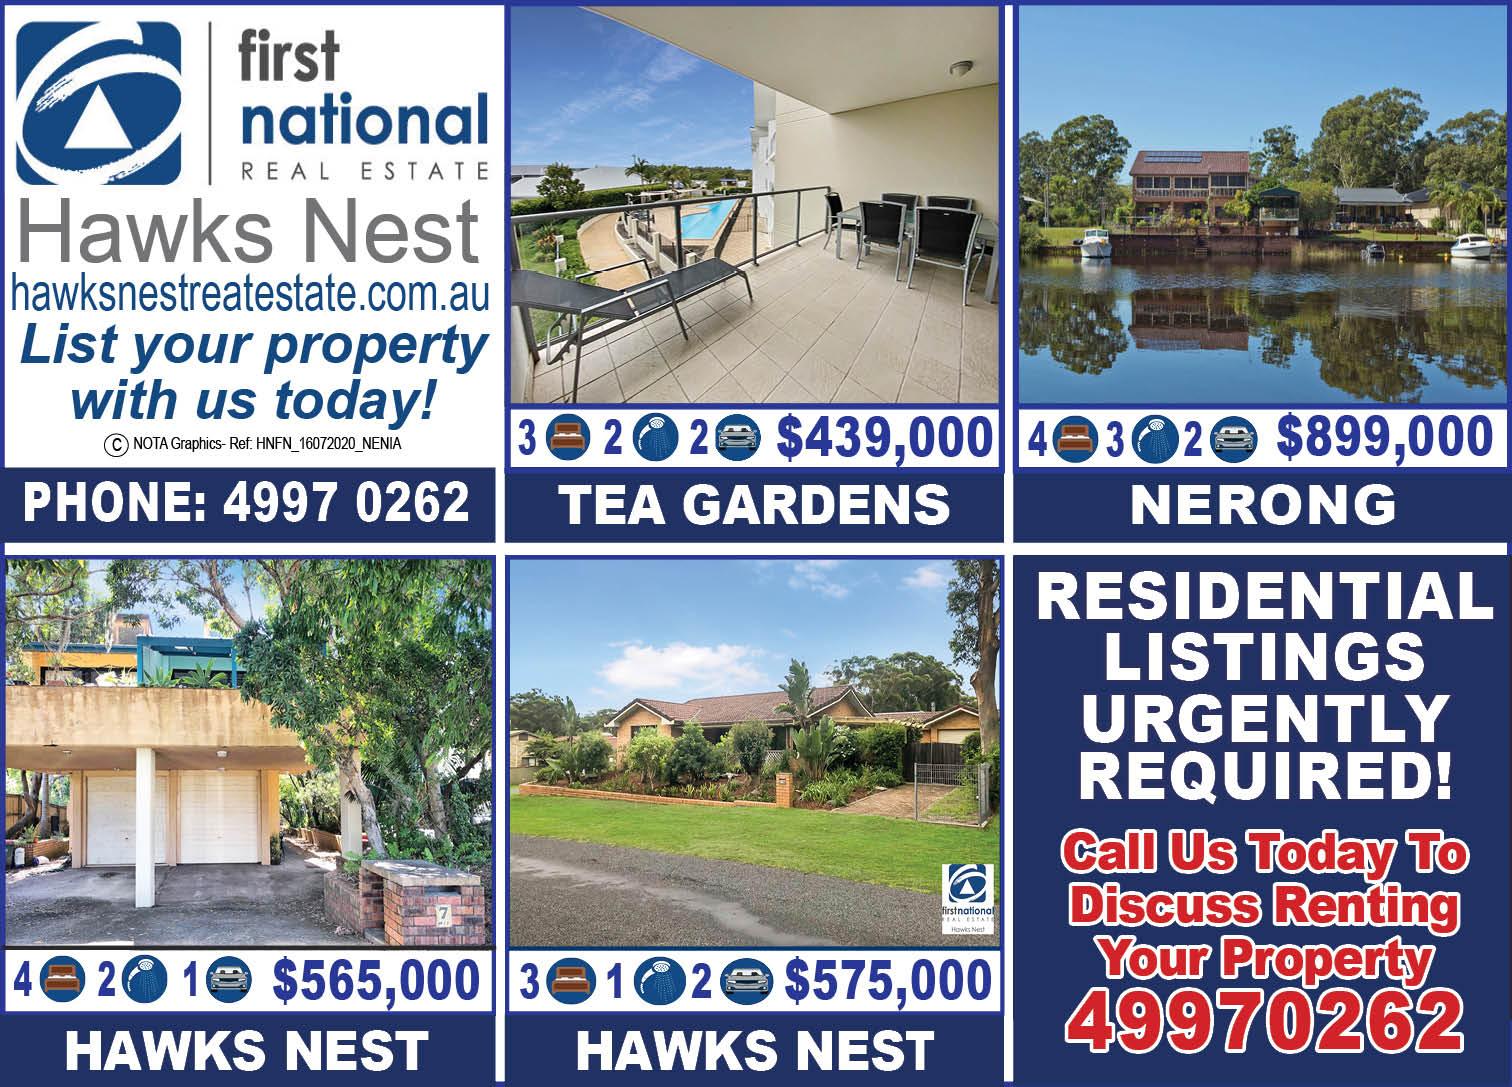 Hawks Nest First National